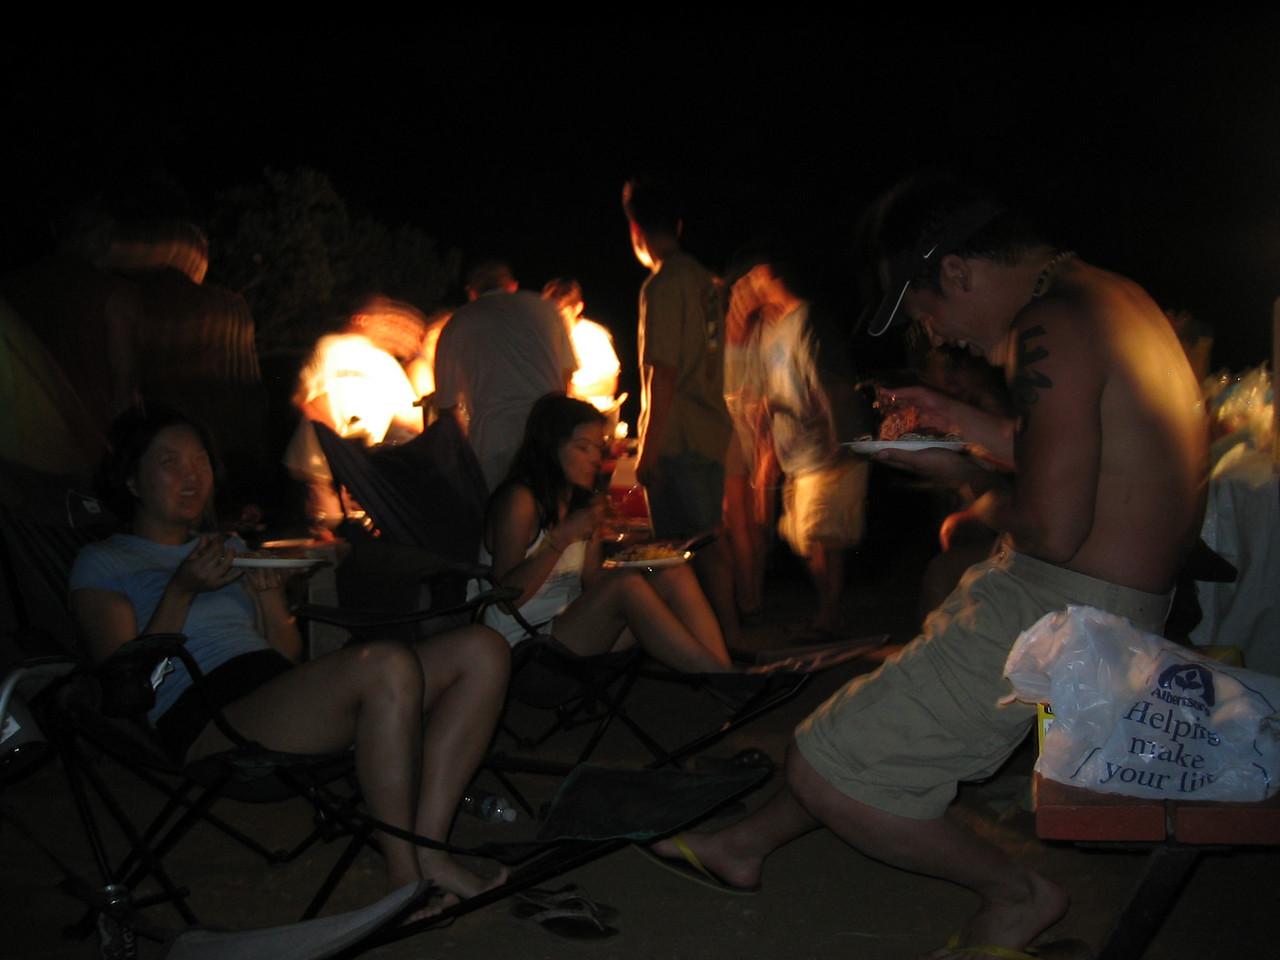 2003 08 16 Saturday - Lake Berryessa Trip, blurred Cheryl Hsih, Audrey Wu, & Johnny Lin